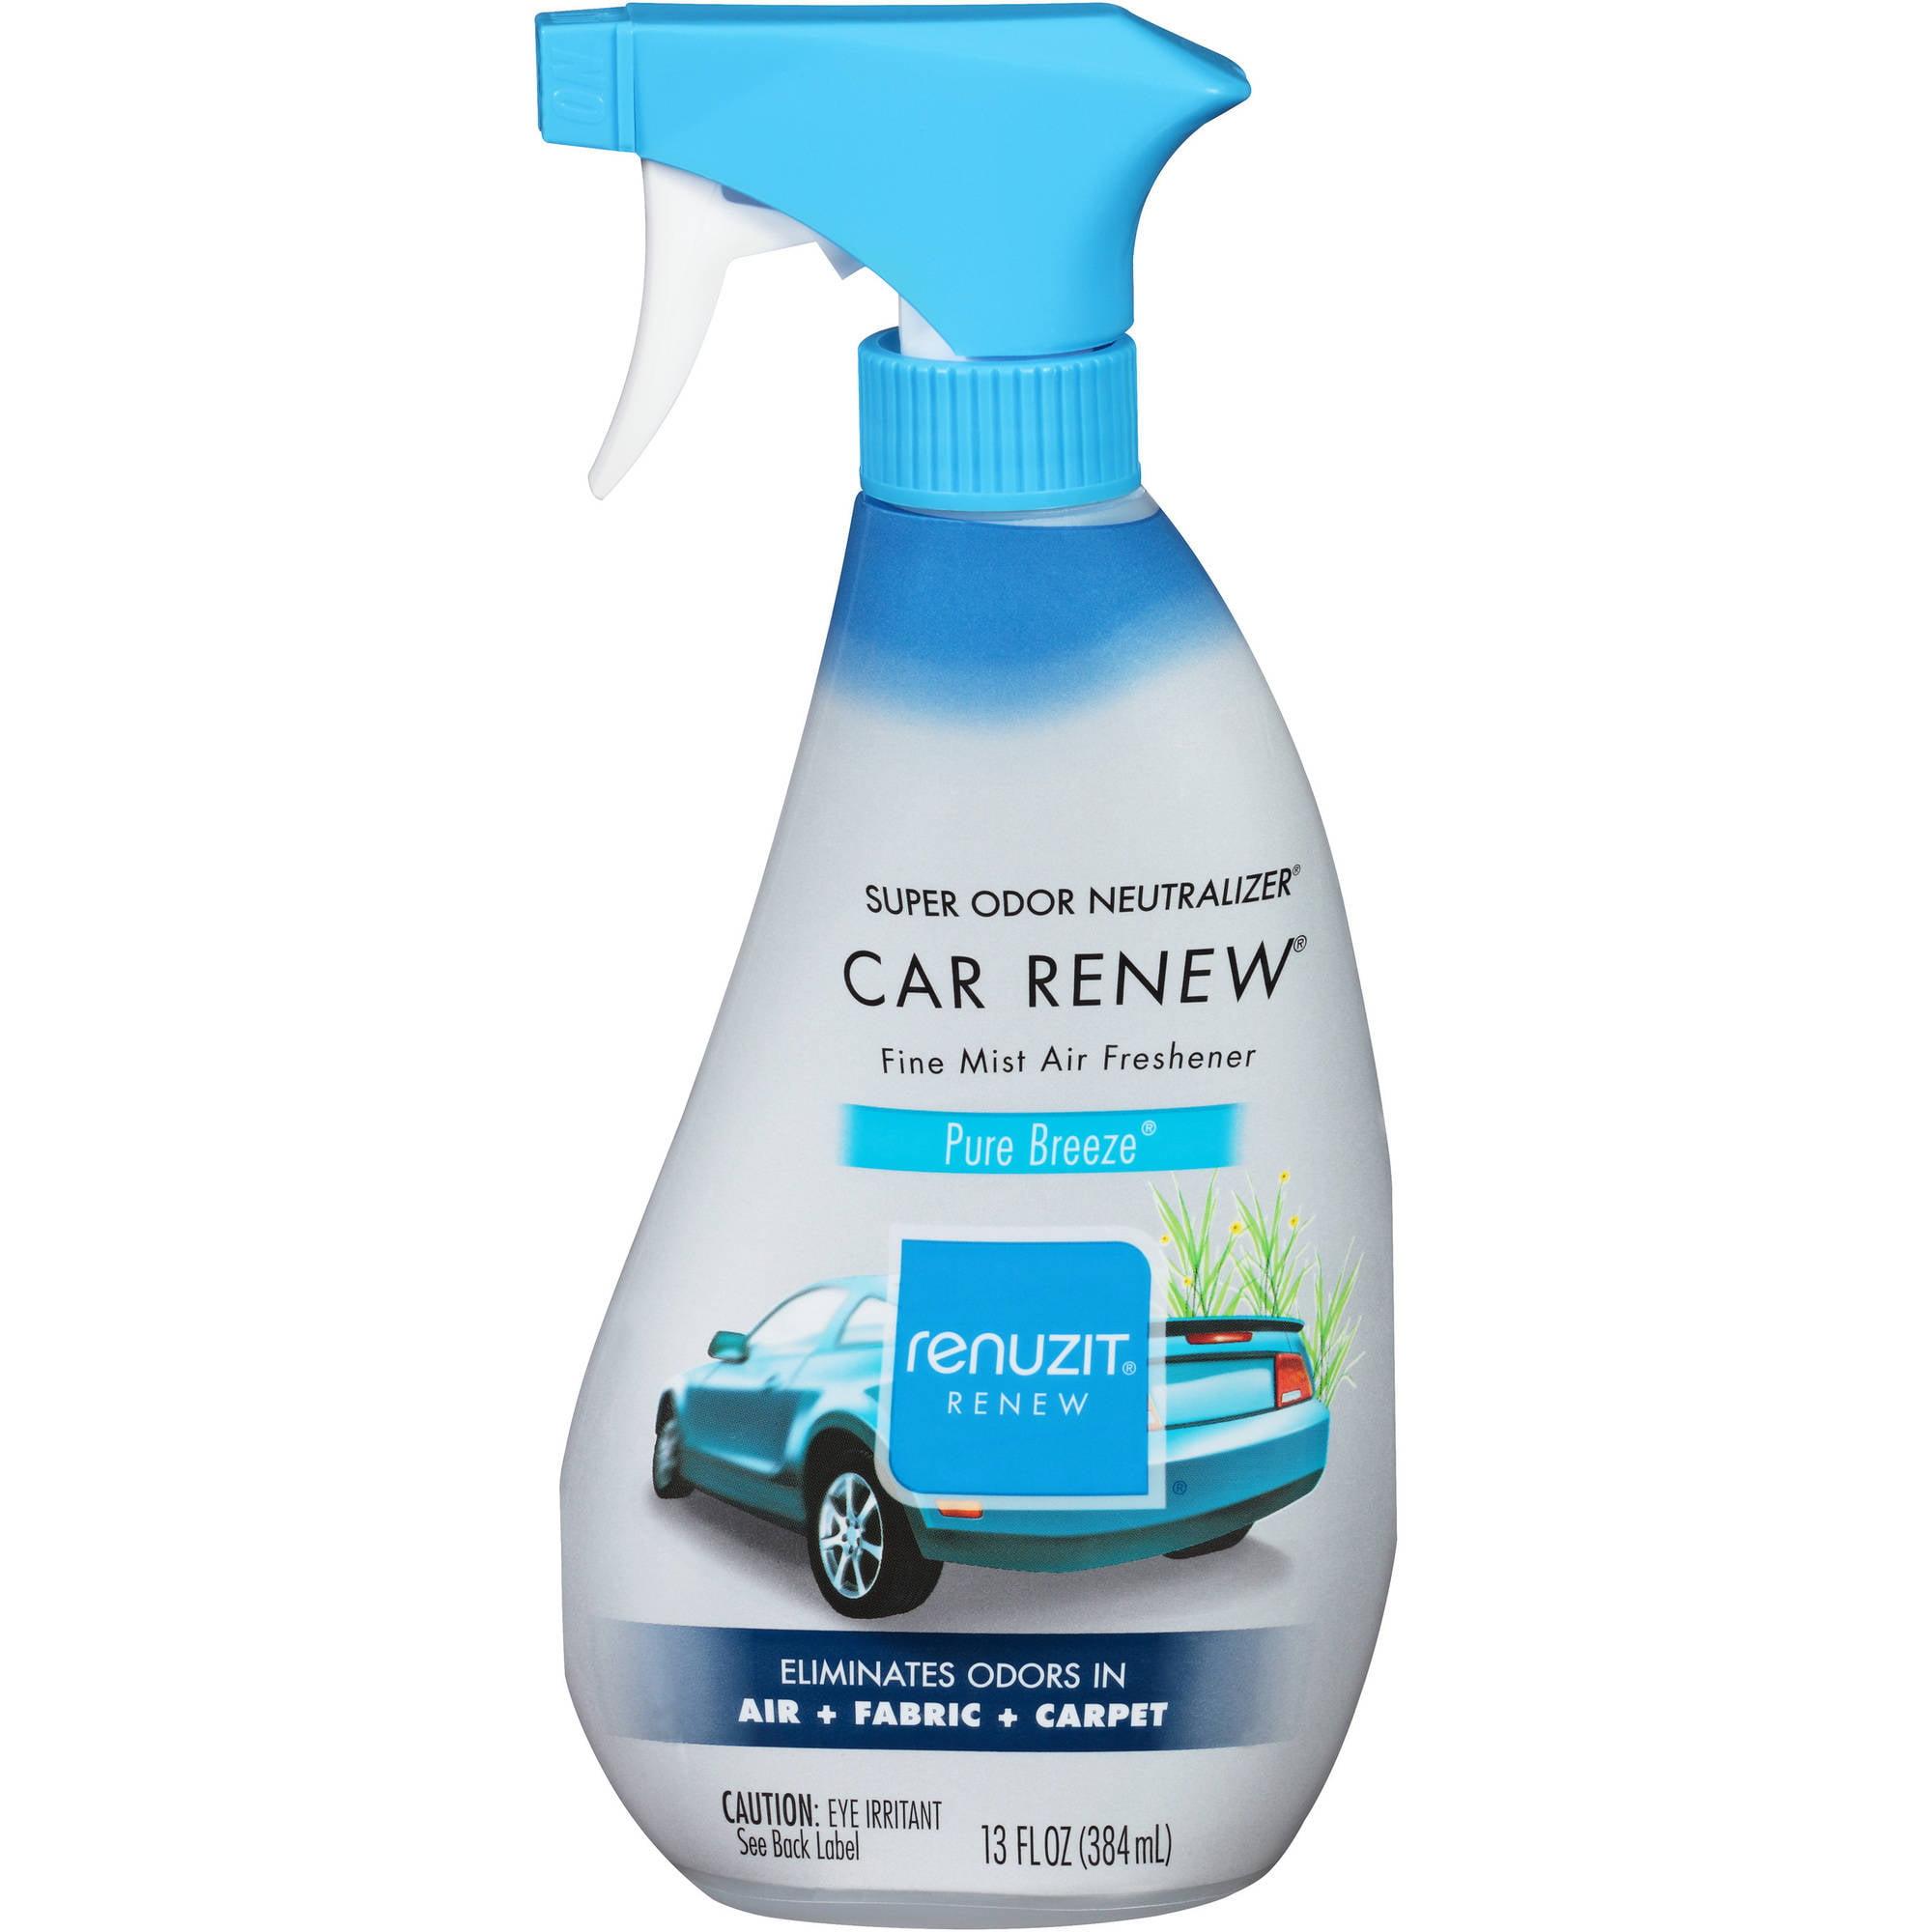 Renuzit Simply Refreshed Solid Air Freshener, Simply Vanilla, 7 Oz   Walmart